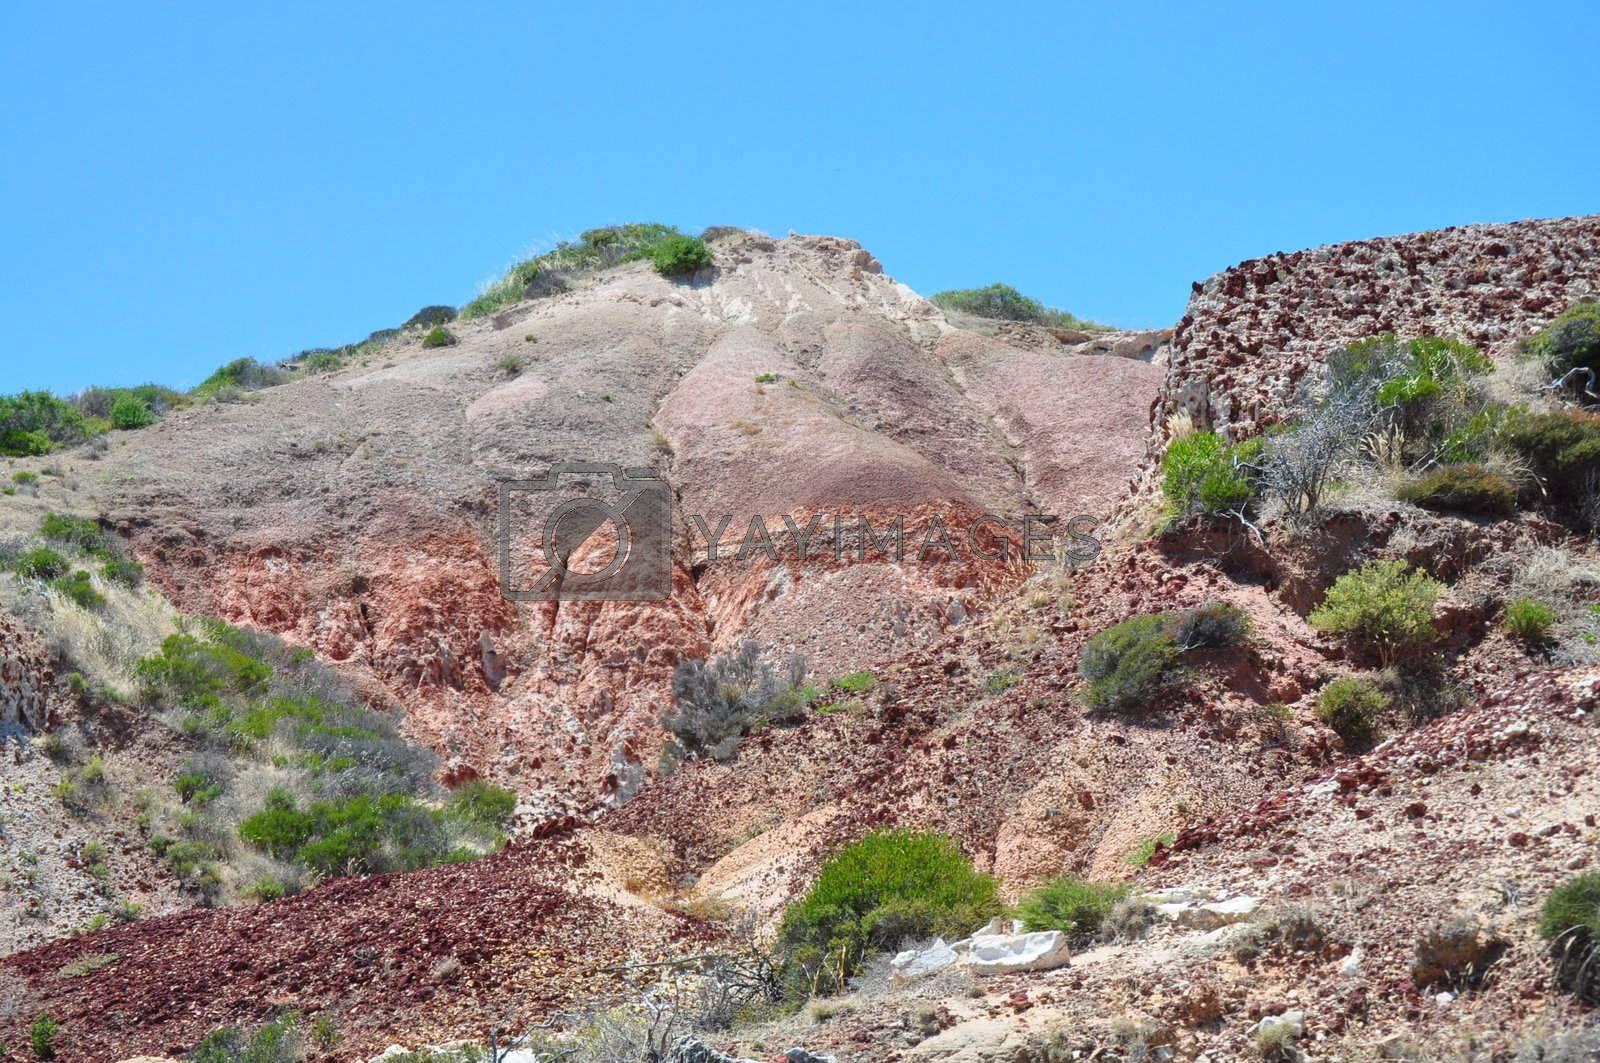 Amazing Rocky mountain in the Hallett Cove Conservation Park, Australia.